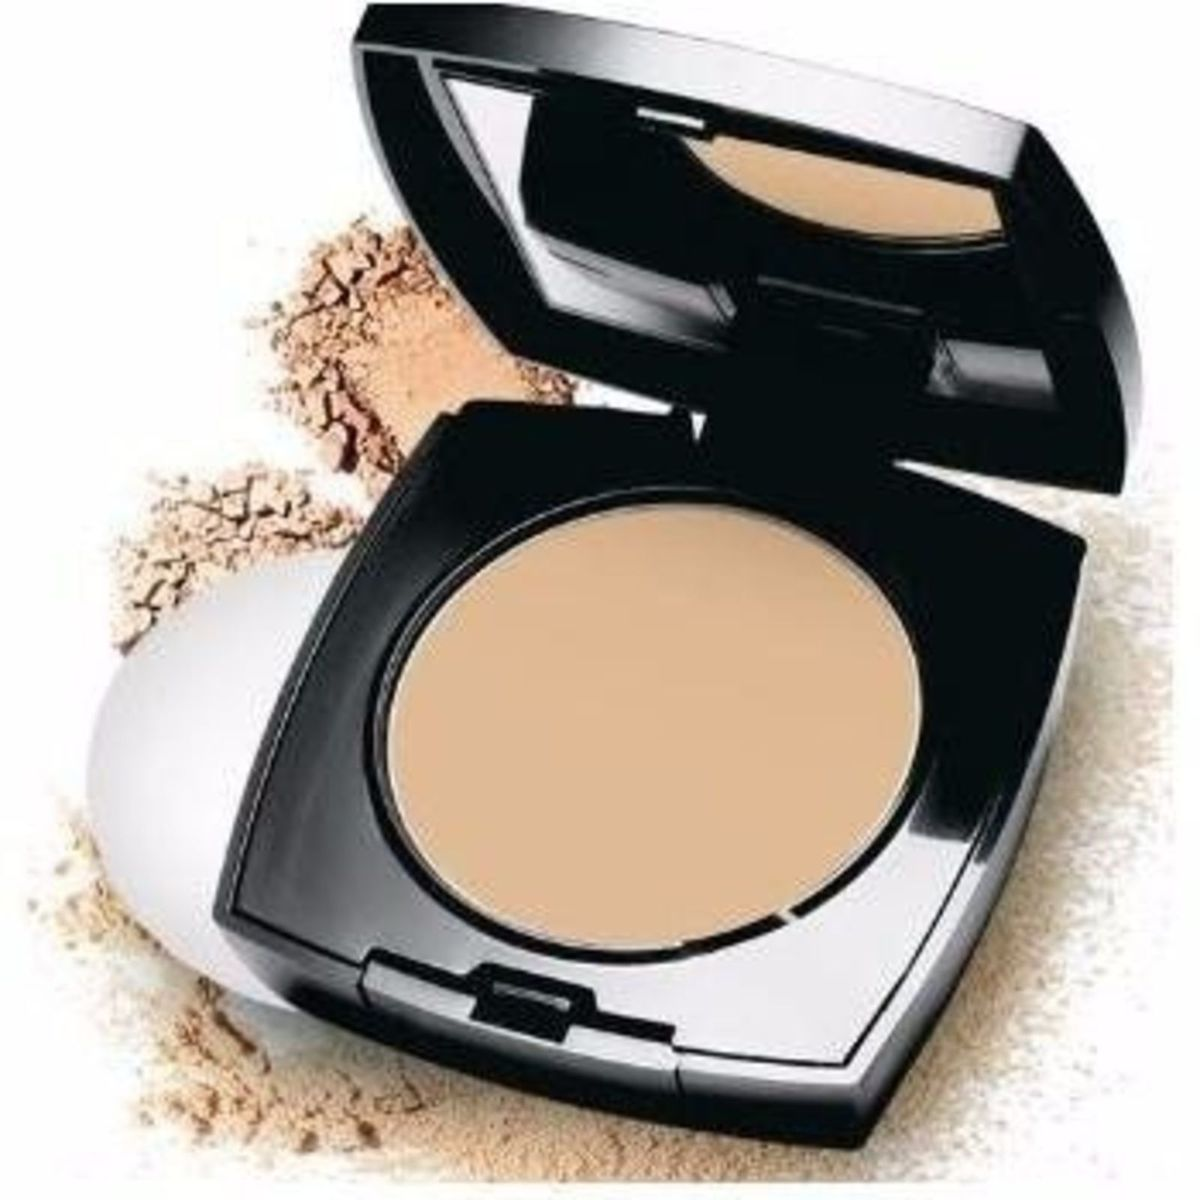 Po Compacto Mark - Avon   Maquiagem Feminina Avon Nunca